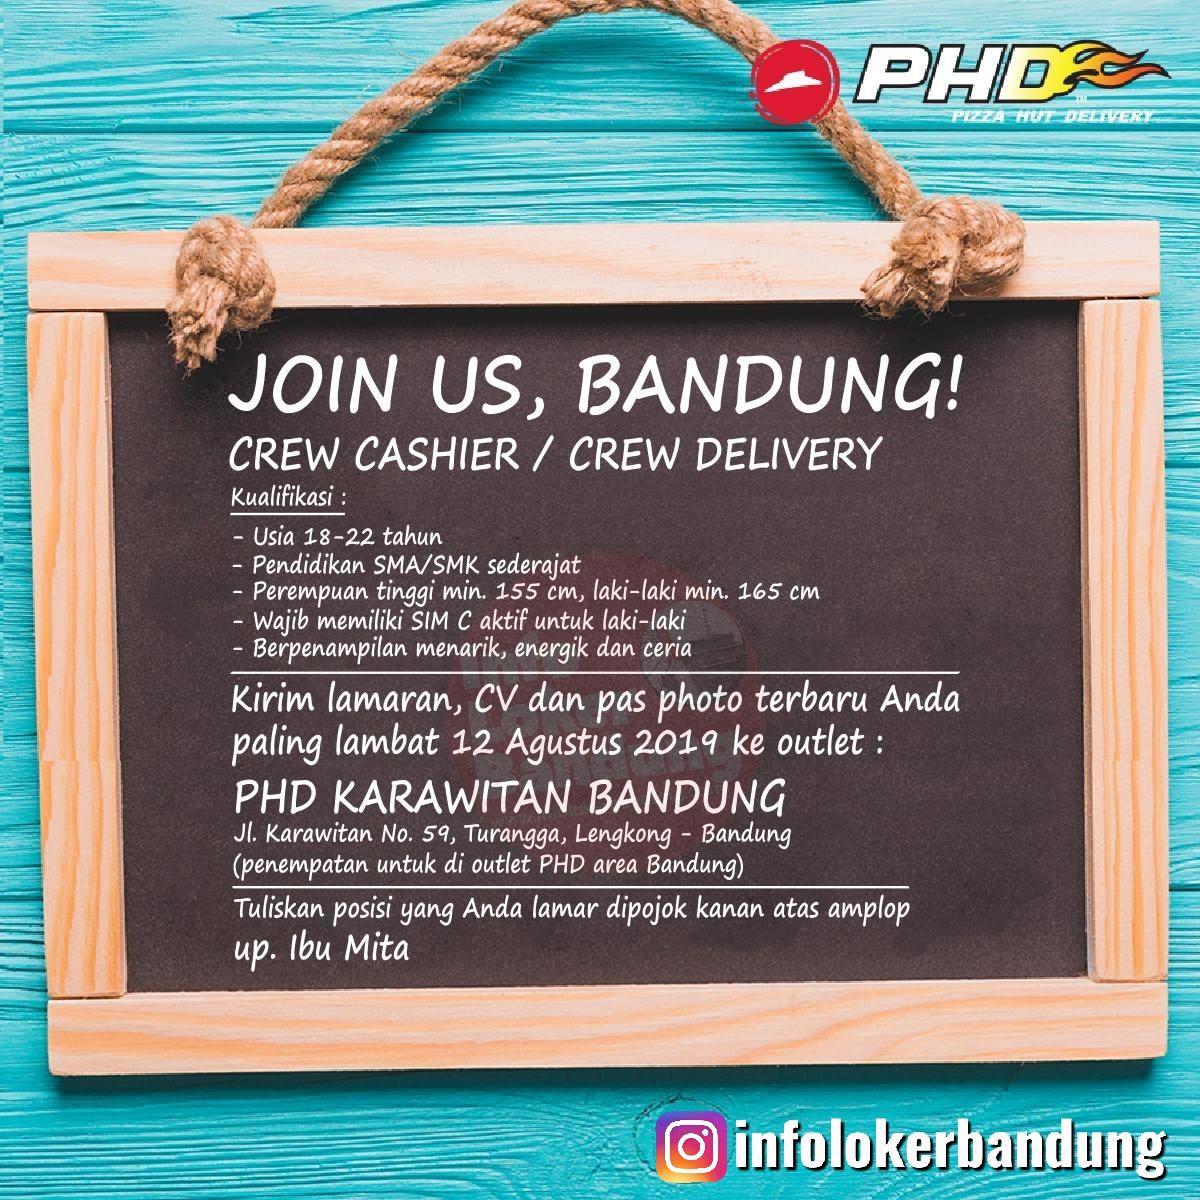 Lowongan Kerja Pizza Hut Delivery (PHD) Karawitan Bandung Agustus 2019